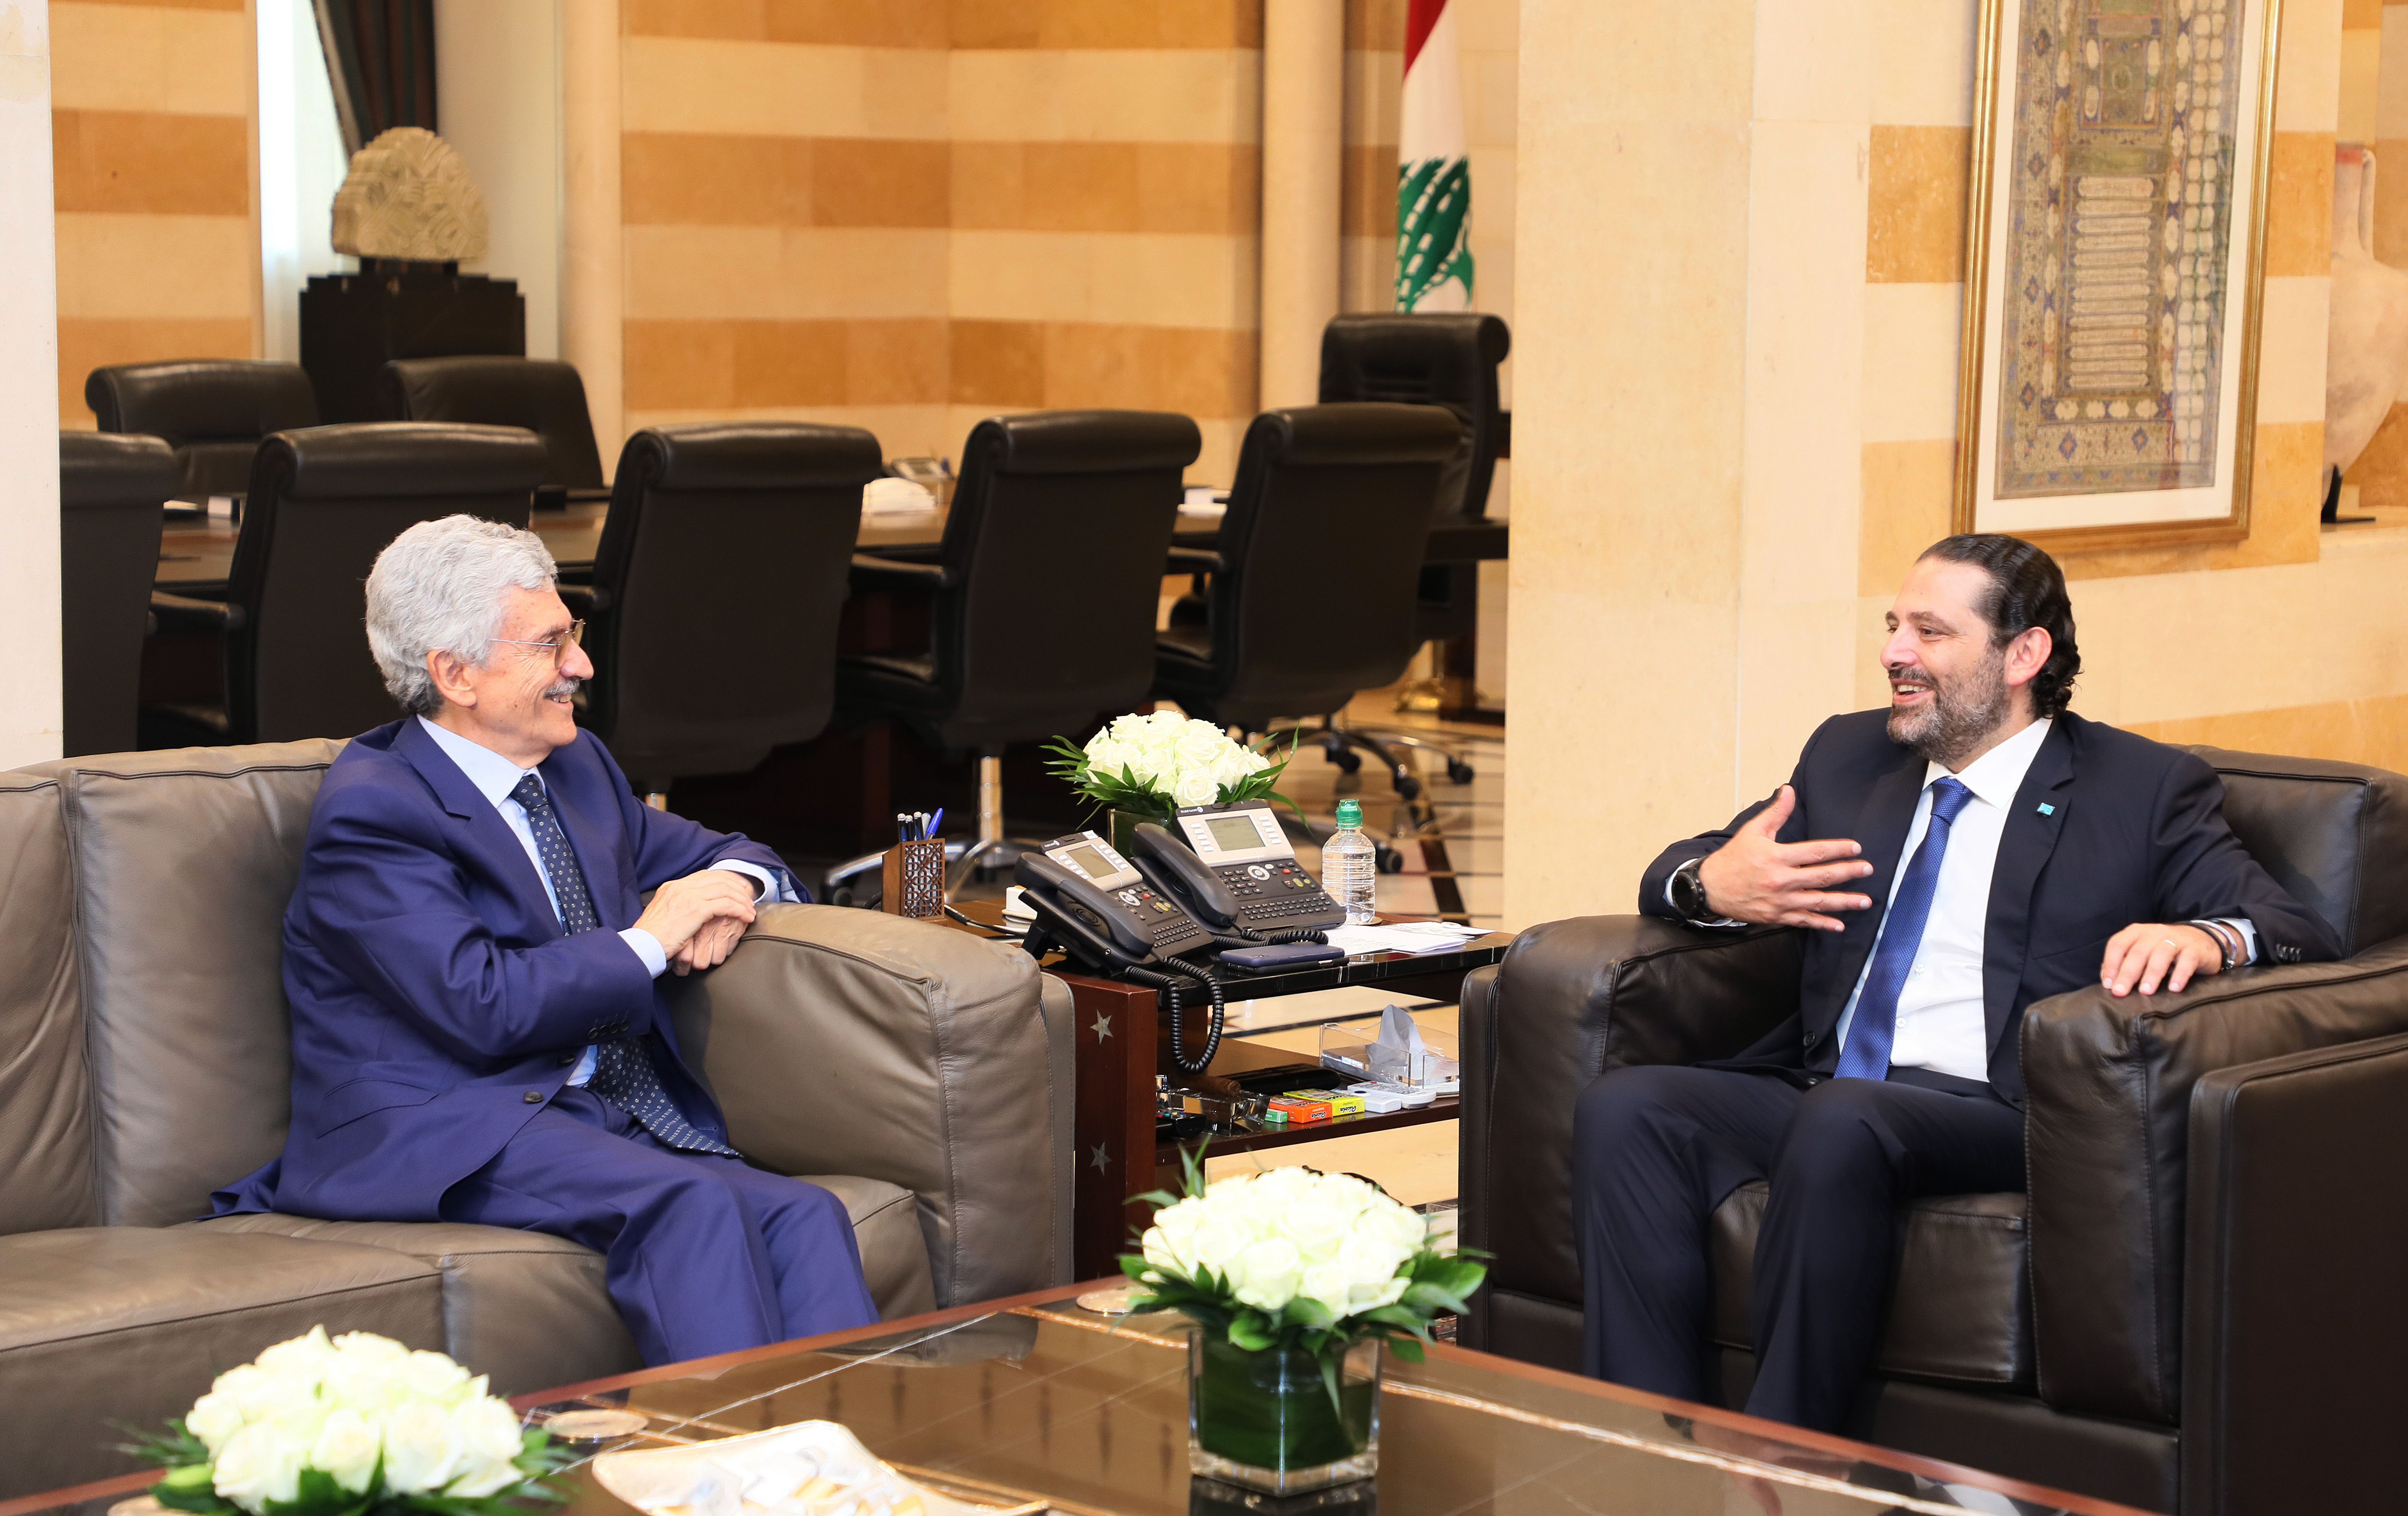 Pr Minister Saad Hariri meets Italian Former Pr Minister